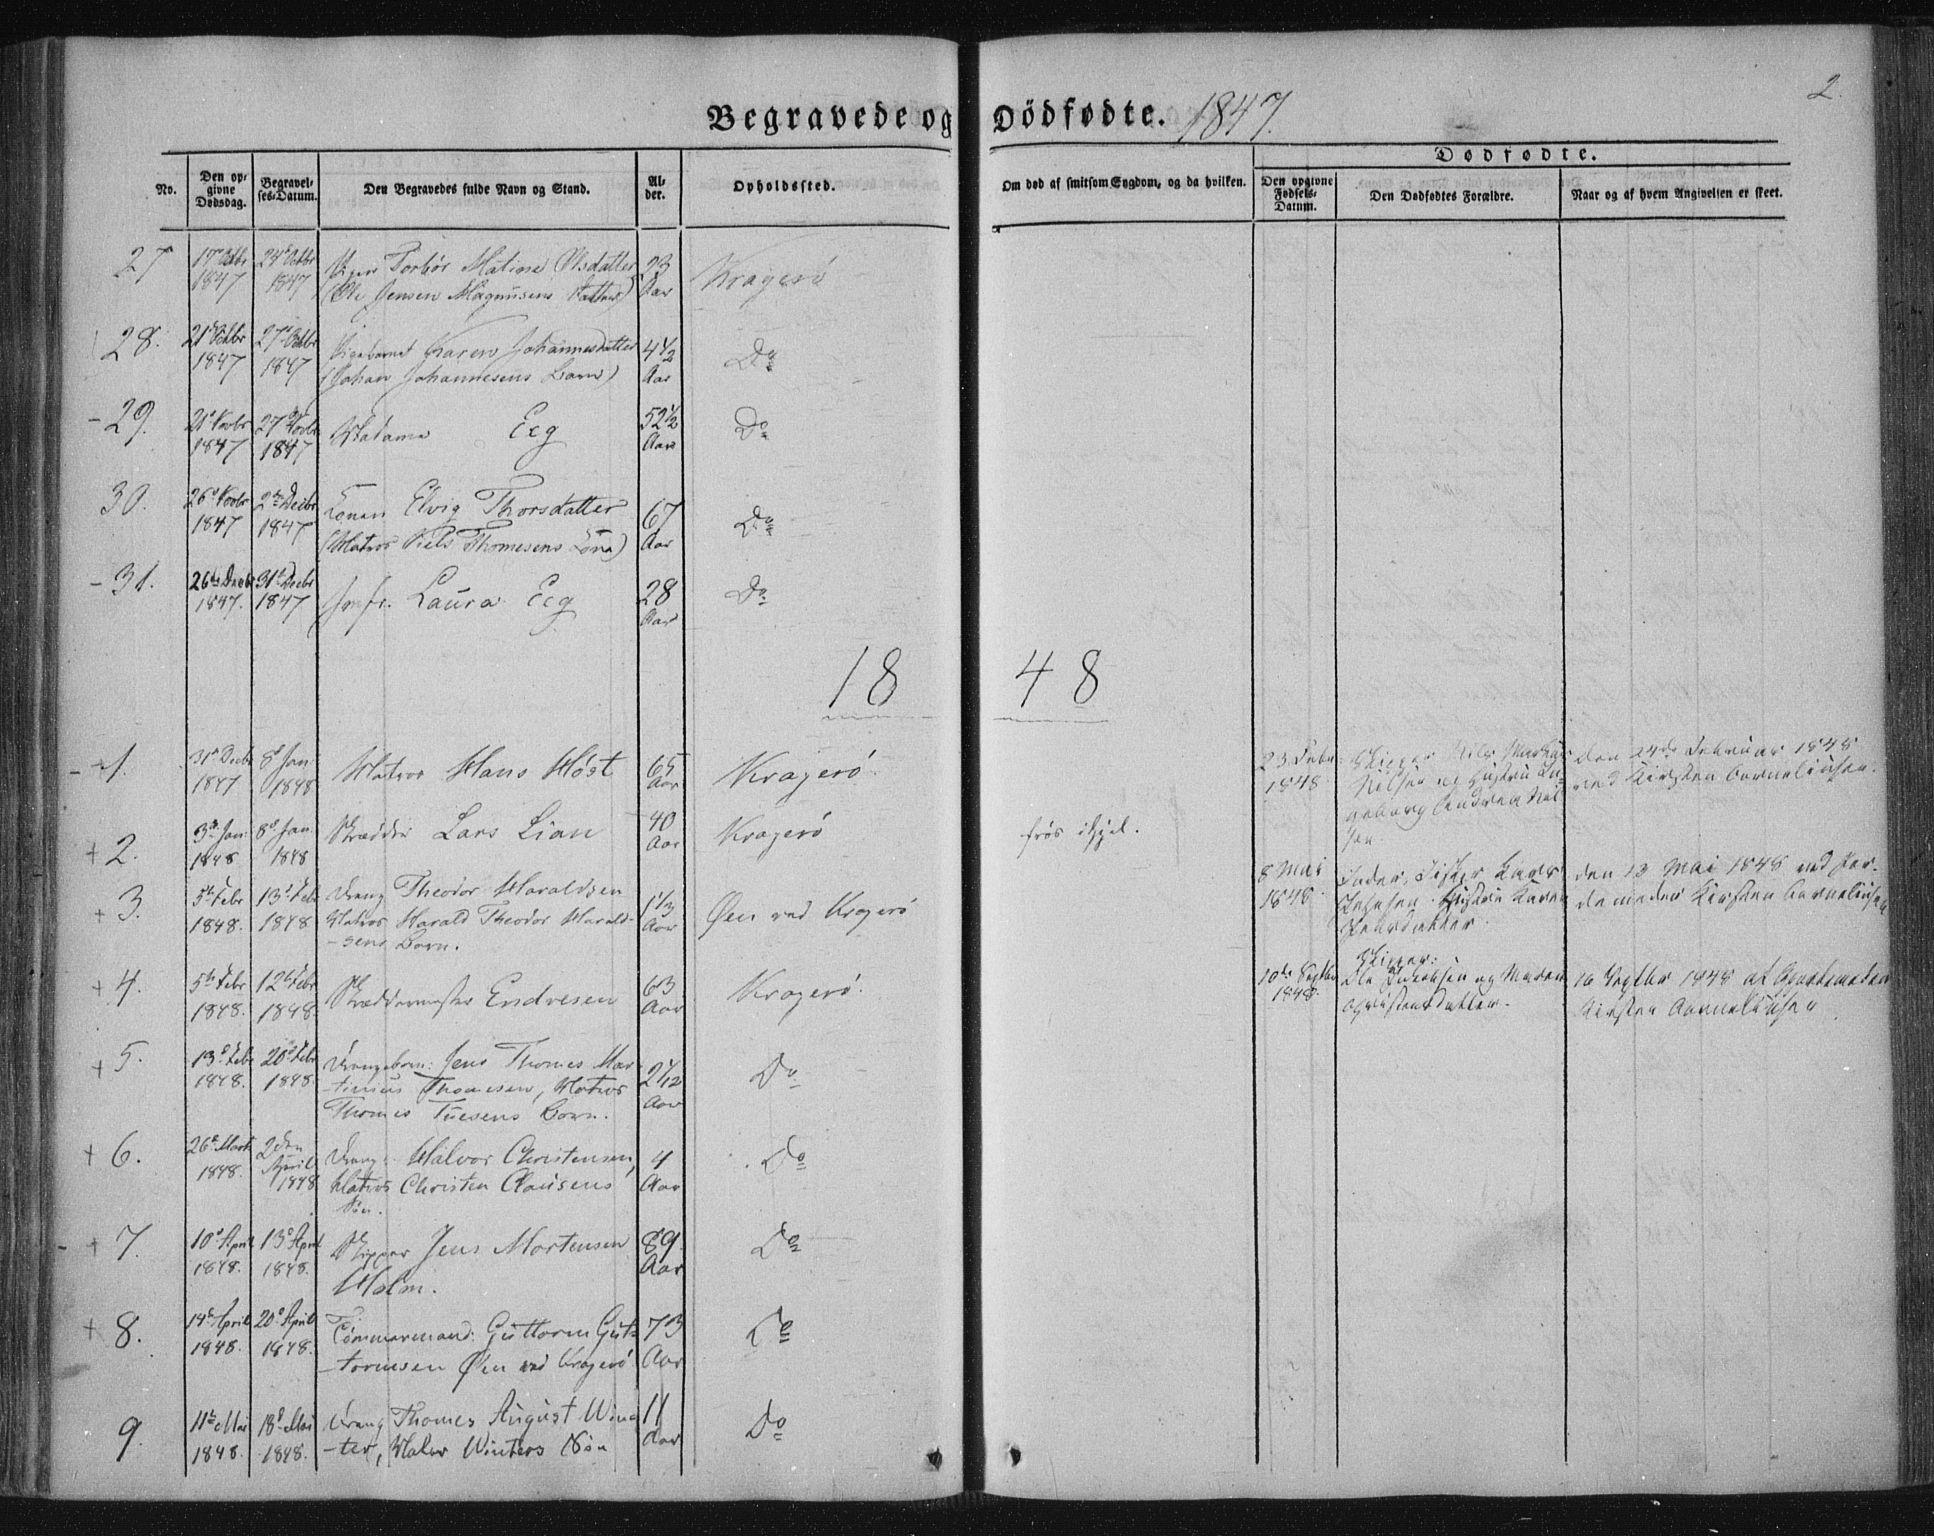 SAKO, Kragerø kirkebøker, F/Fa/L0006: Ministerialbok nr. 6, 1847-1861, s. 2